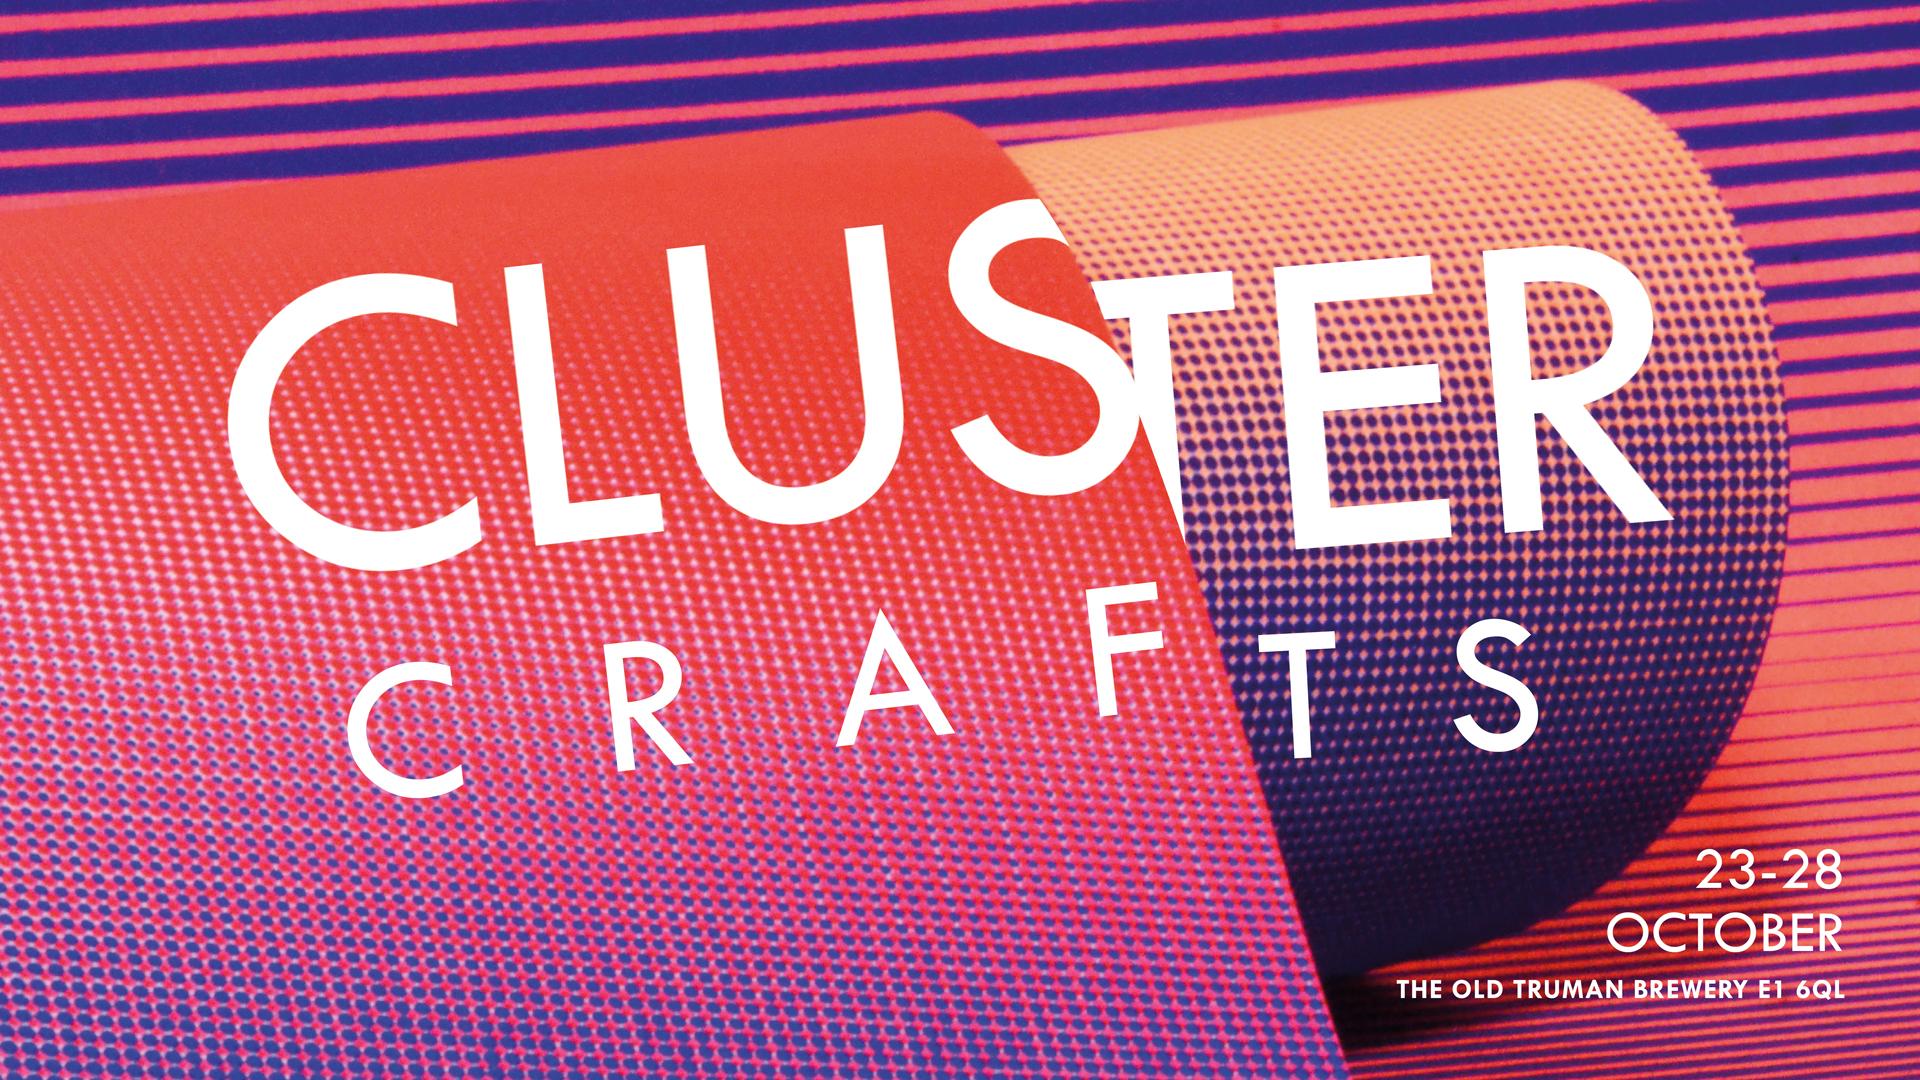 Cluster-Flyer-banner (2).jpg